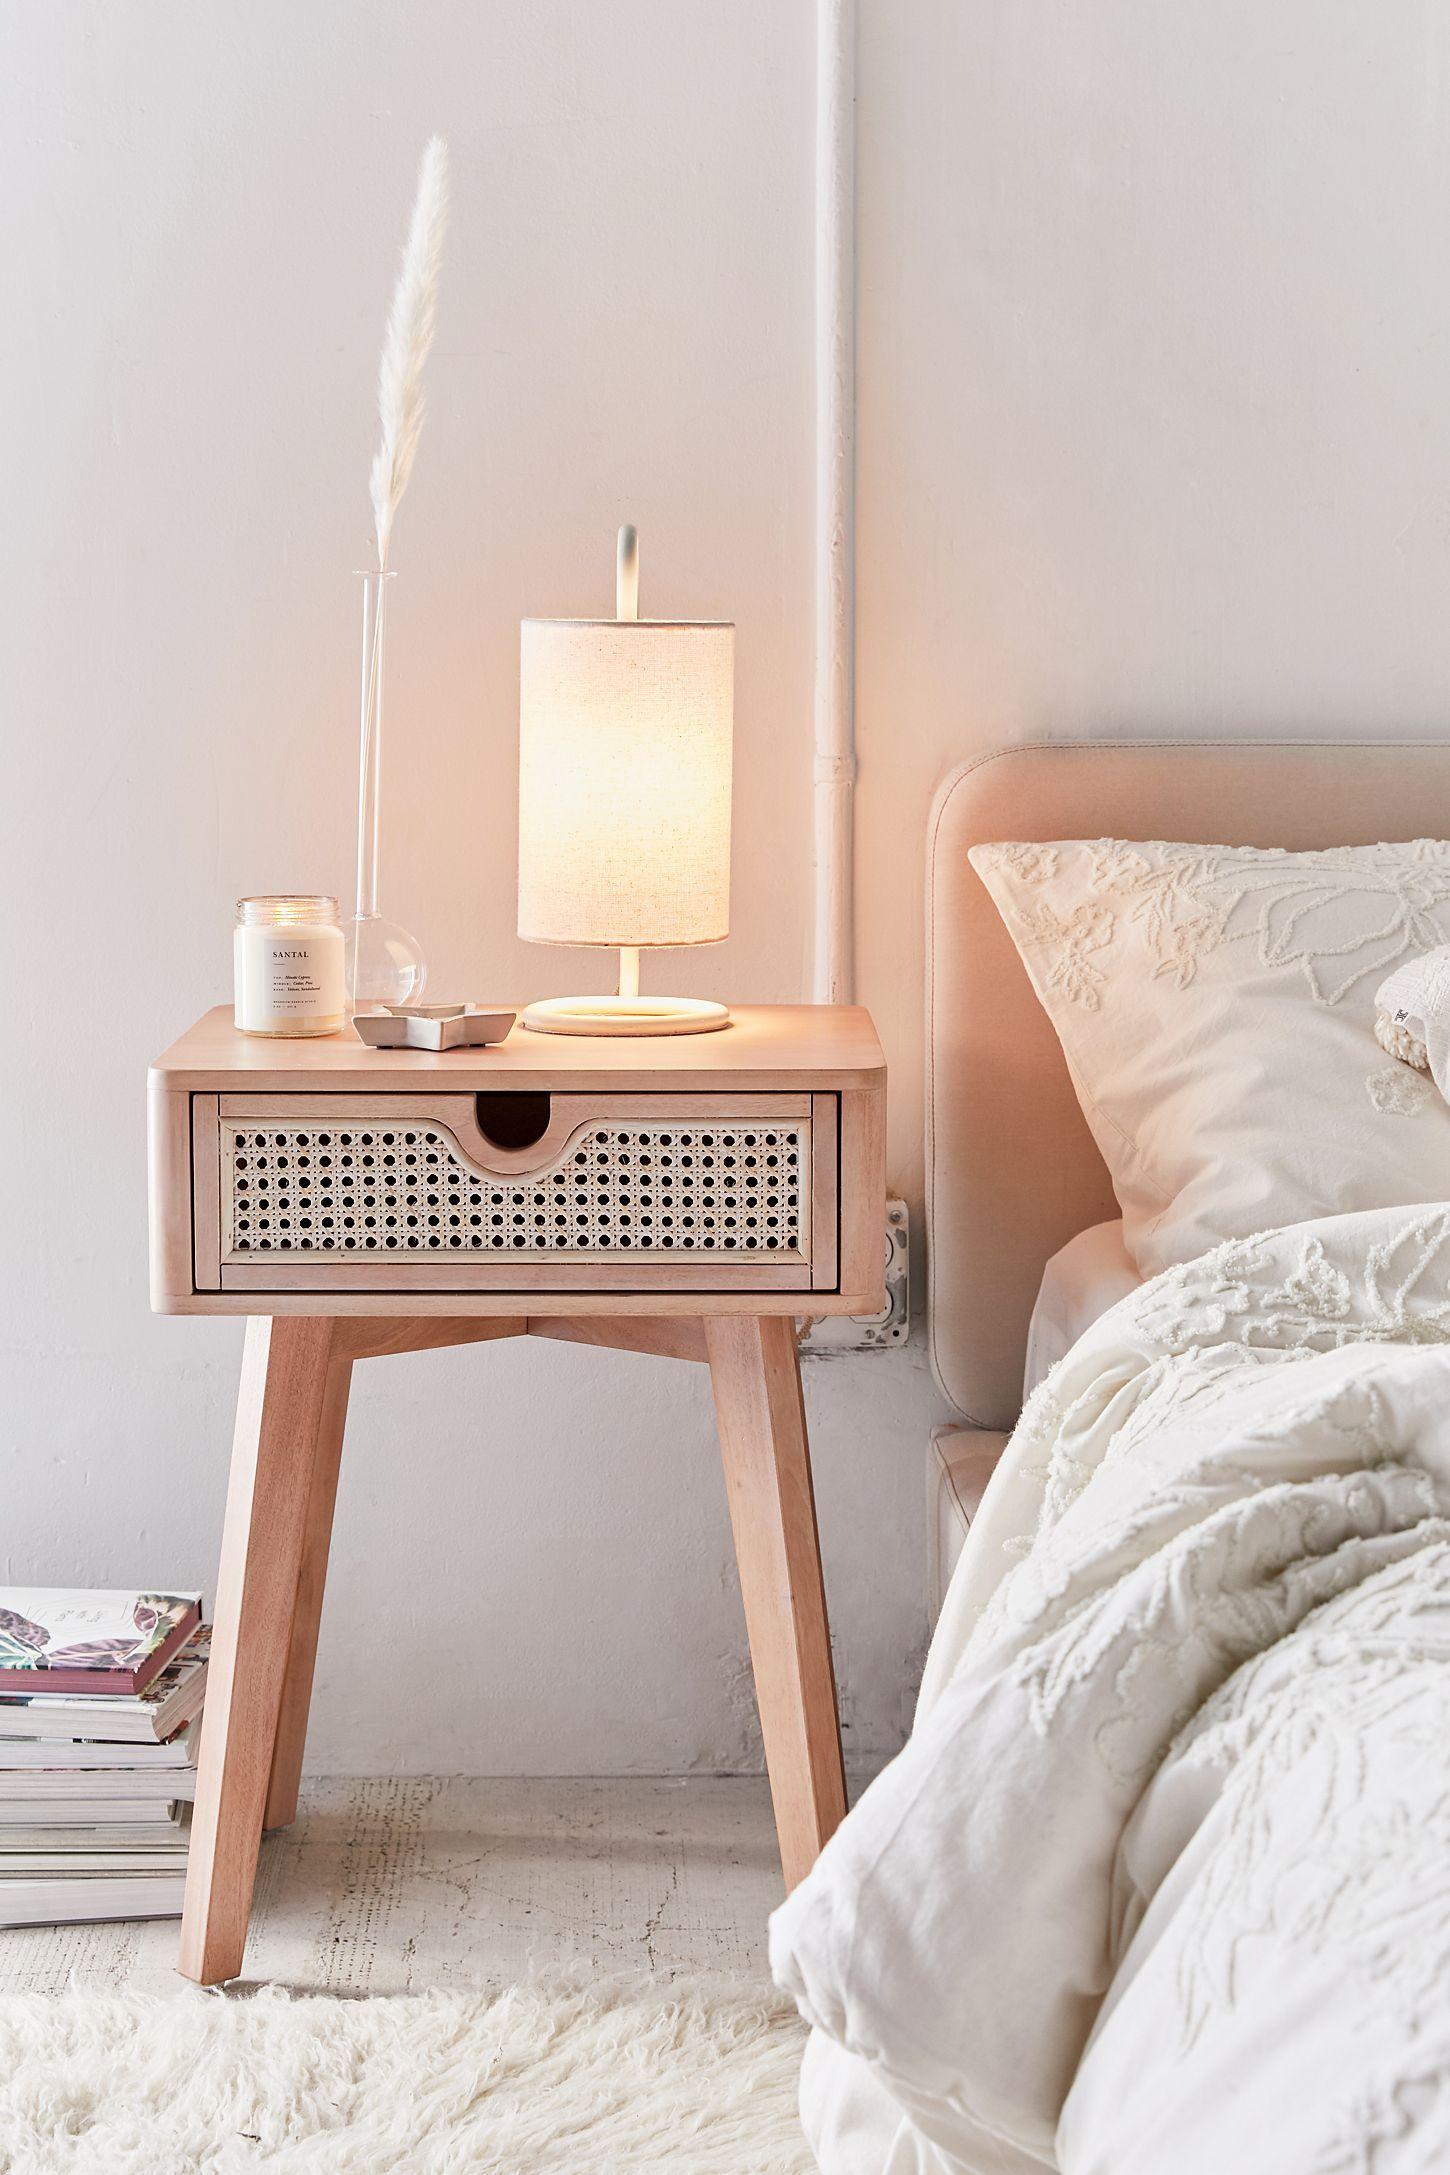 Urban Outfitters Marte Nightstand Nightstand Decor Bedroom Decor